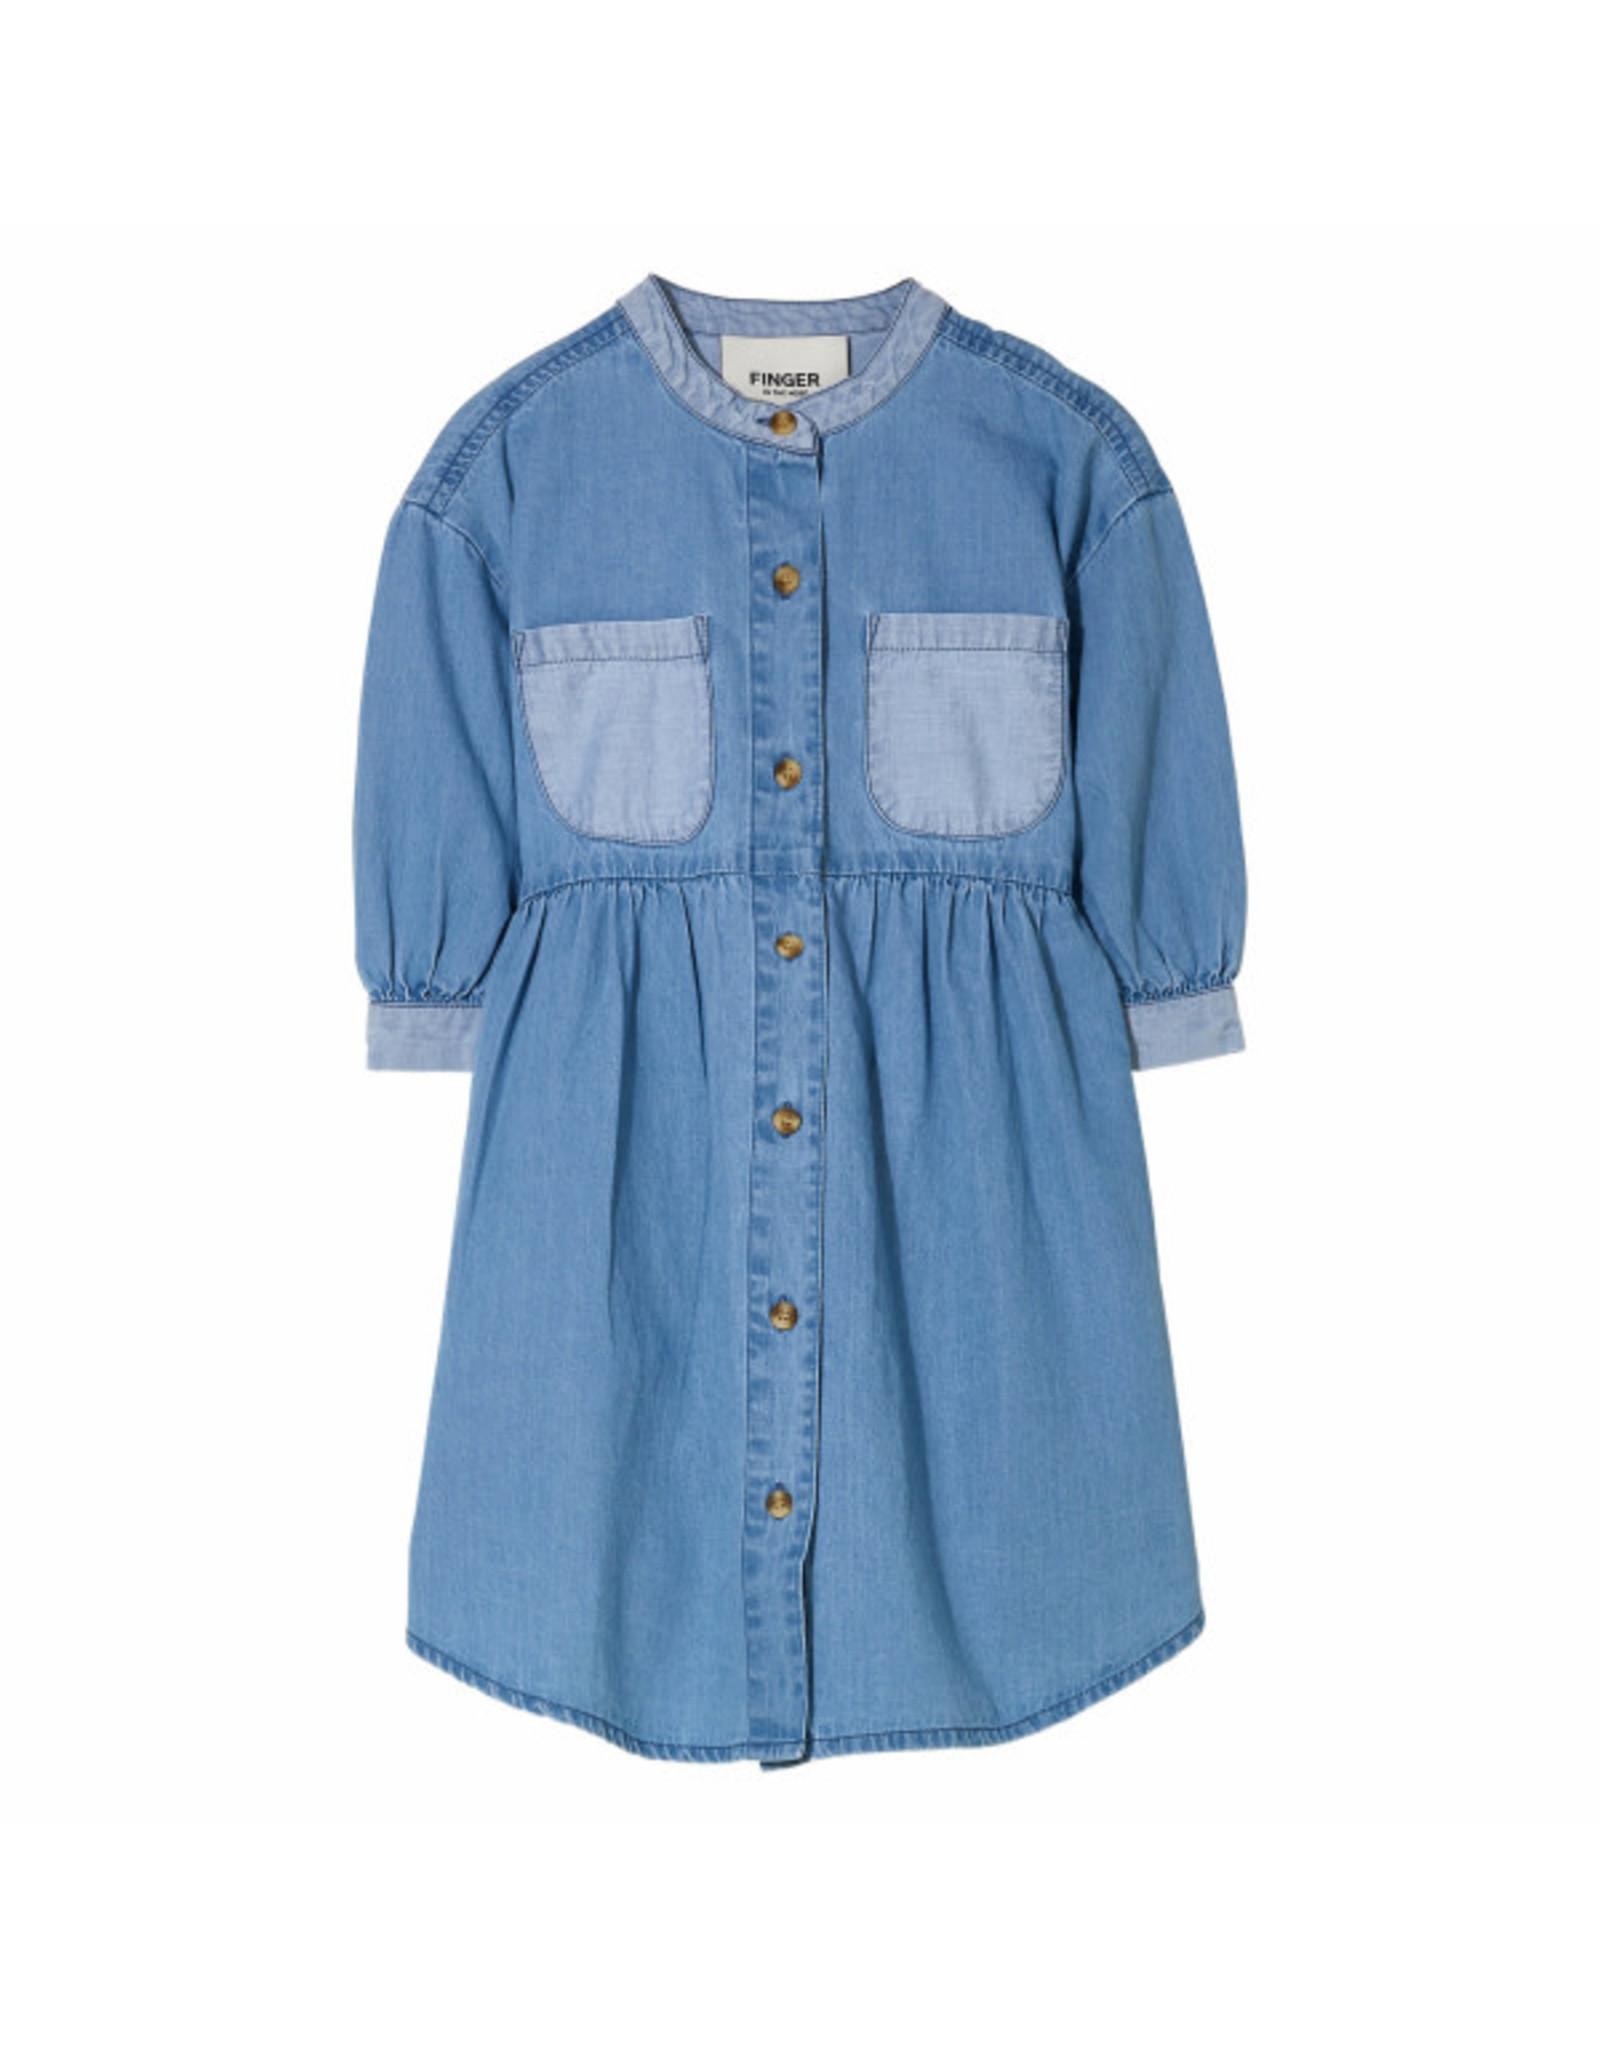 FITN SS21 Swing shirt dress